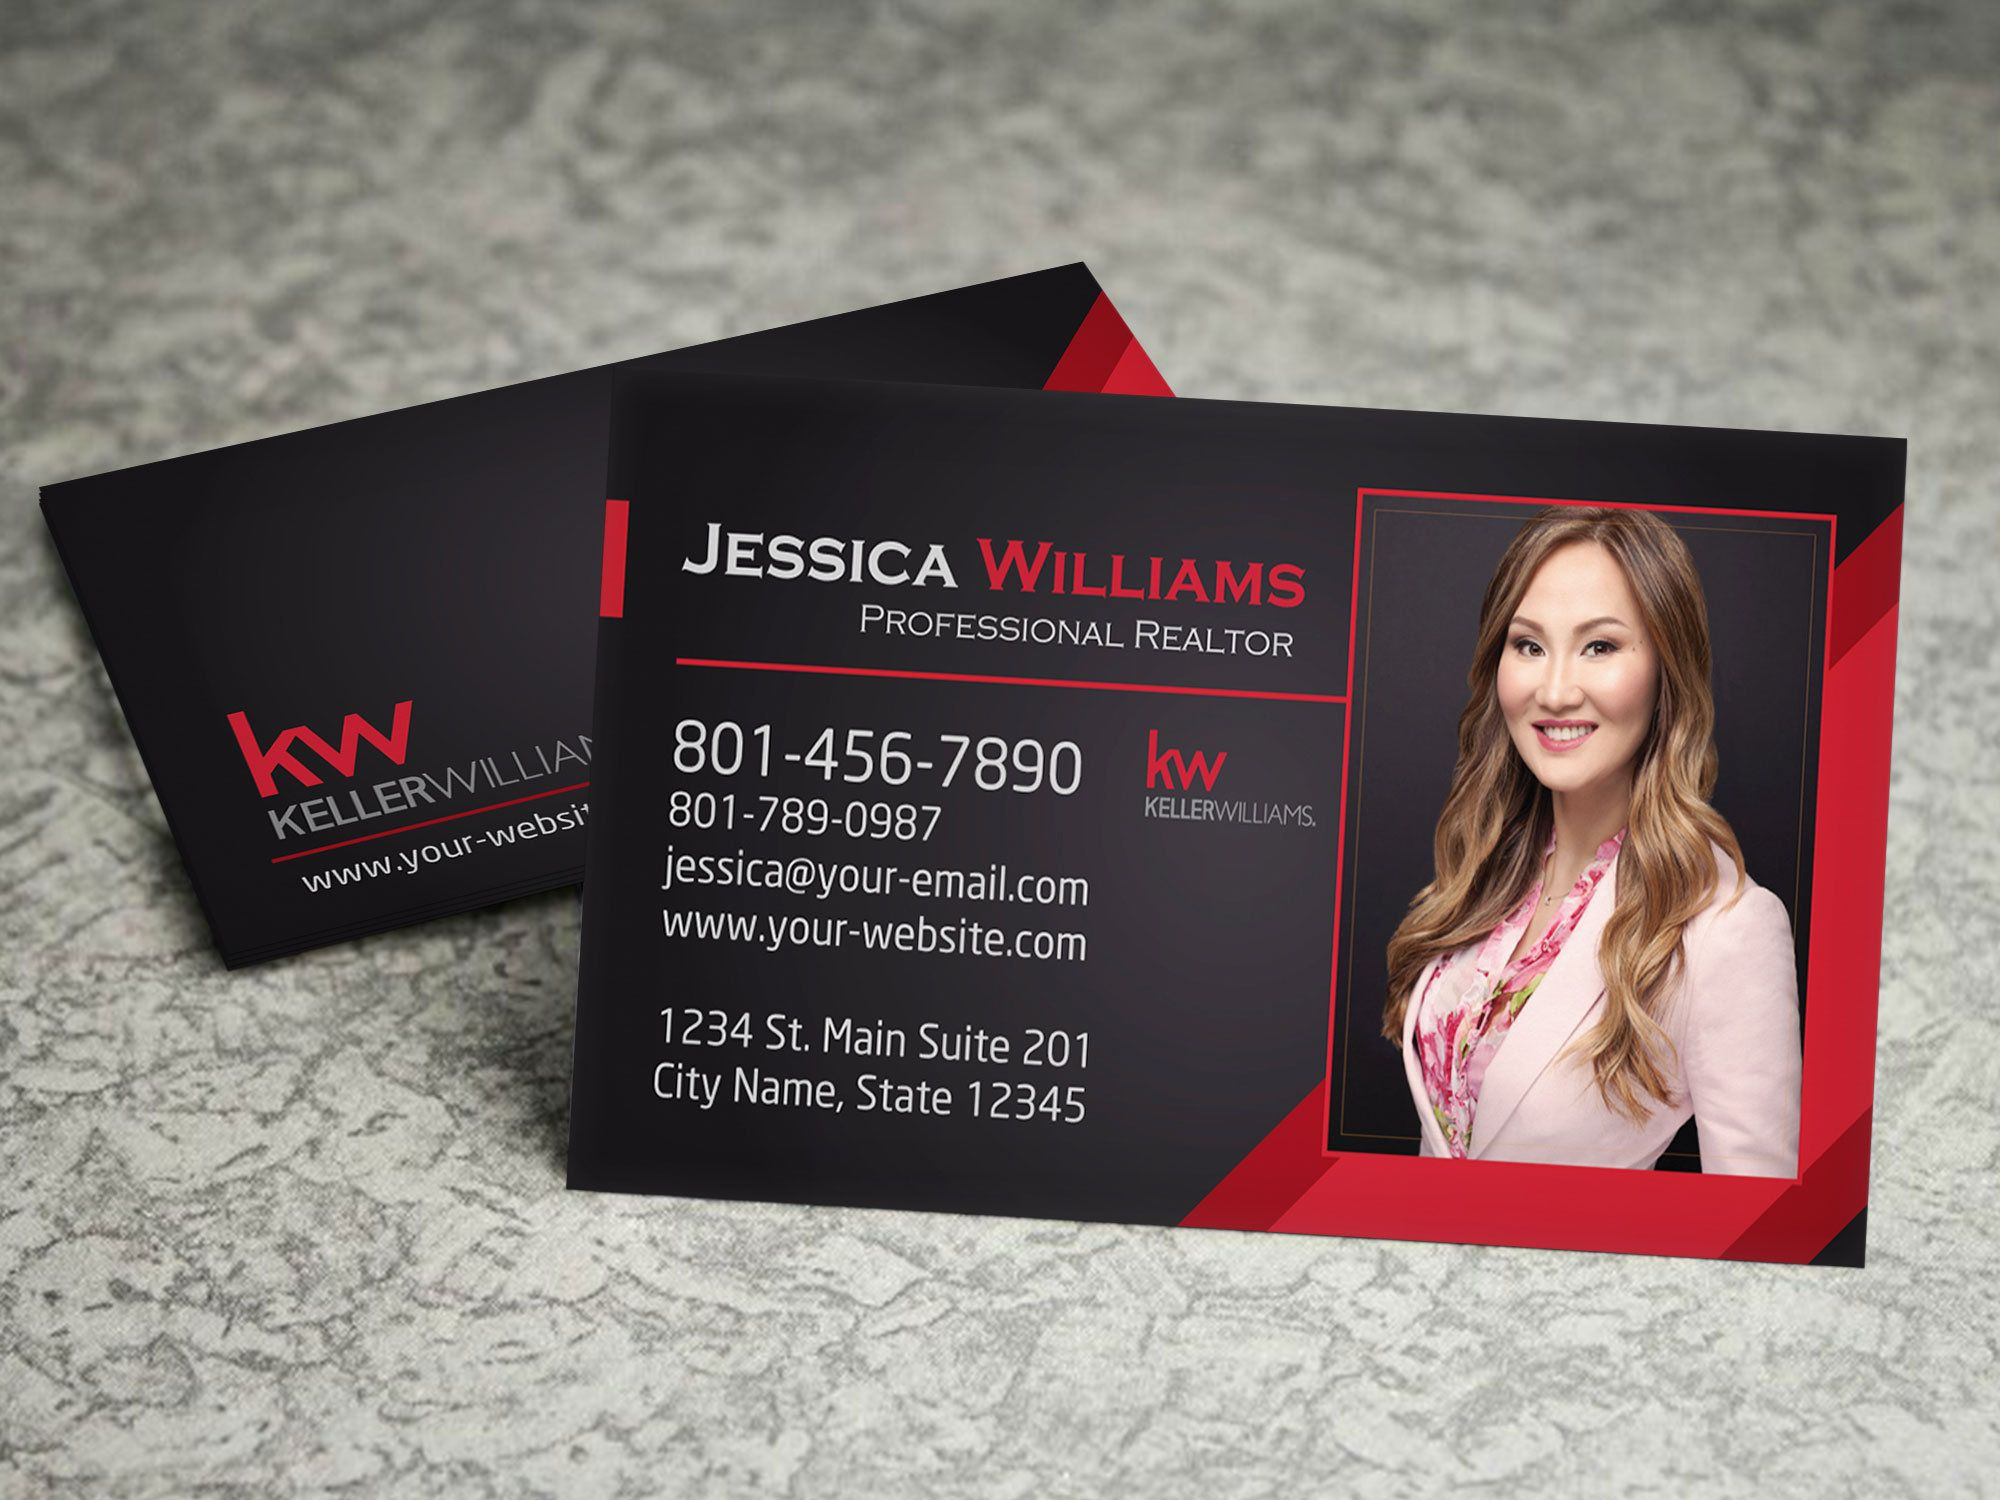 Keller Williams Real Estate Business Card Real Estate Etsy In 2021 Keller Williams Business Cards Marketing Business Card Real Estate Business Cards